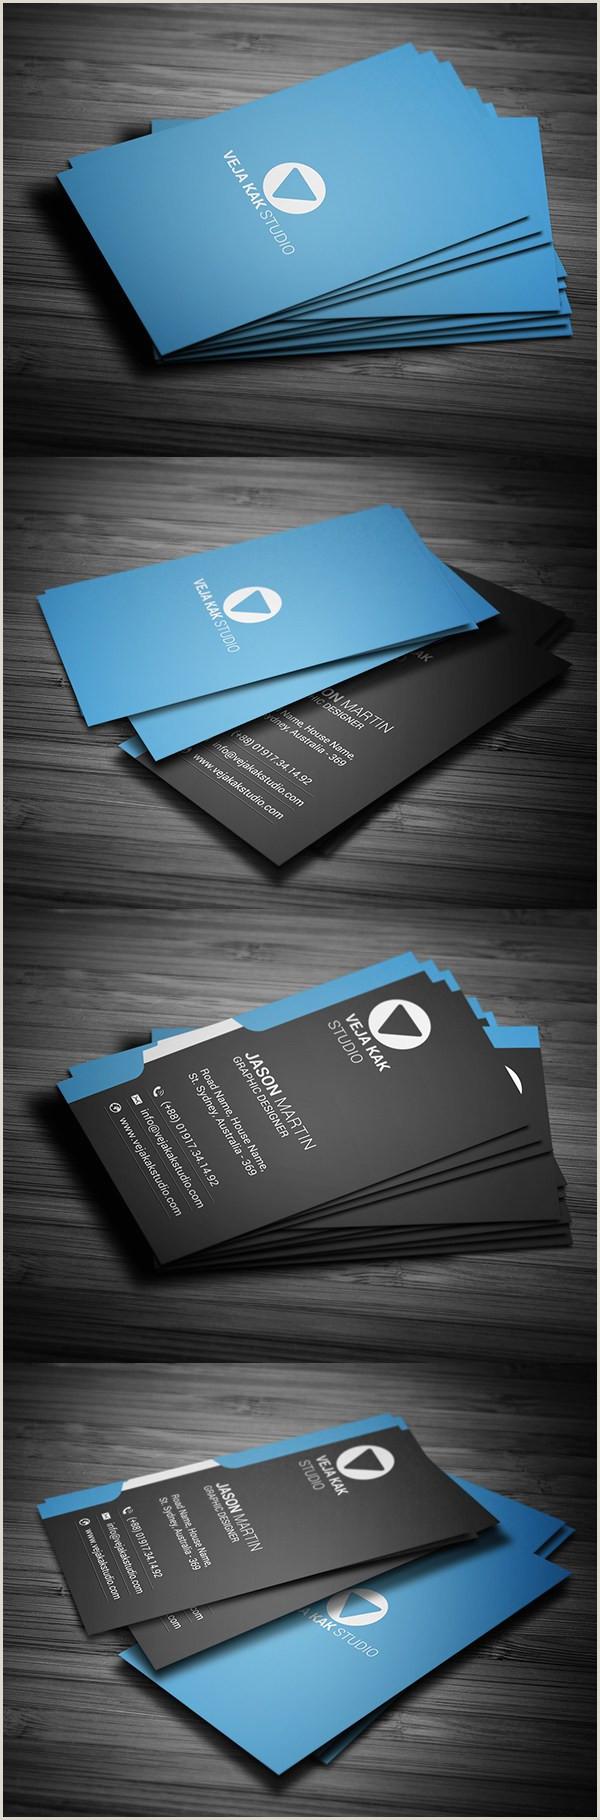 Design Unique Business Cards Modern Vertical Business Card